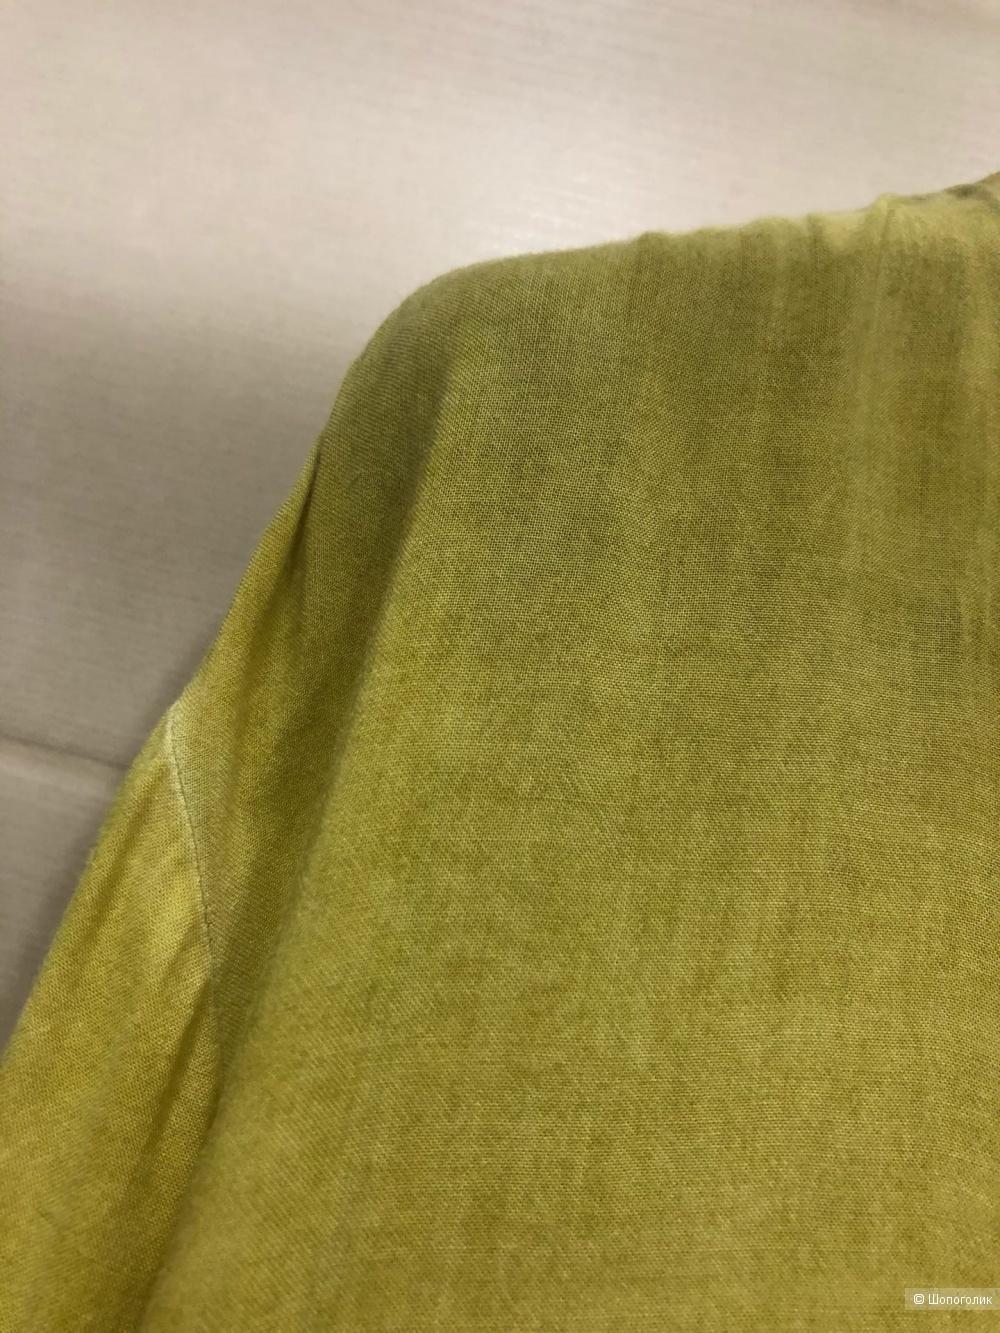 Блузка Comma. Размер 48-50.